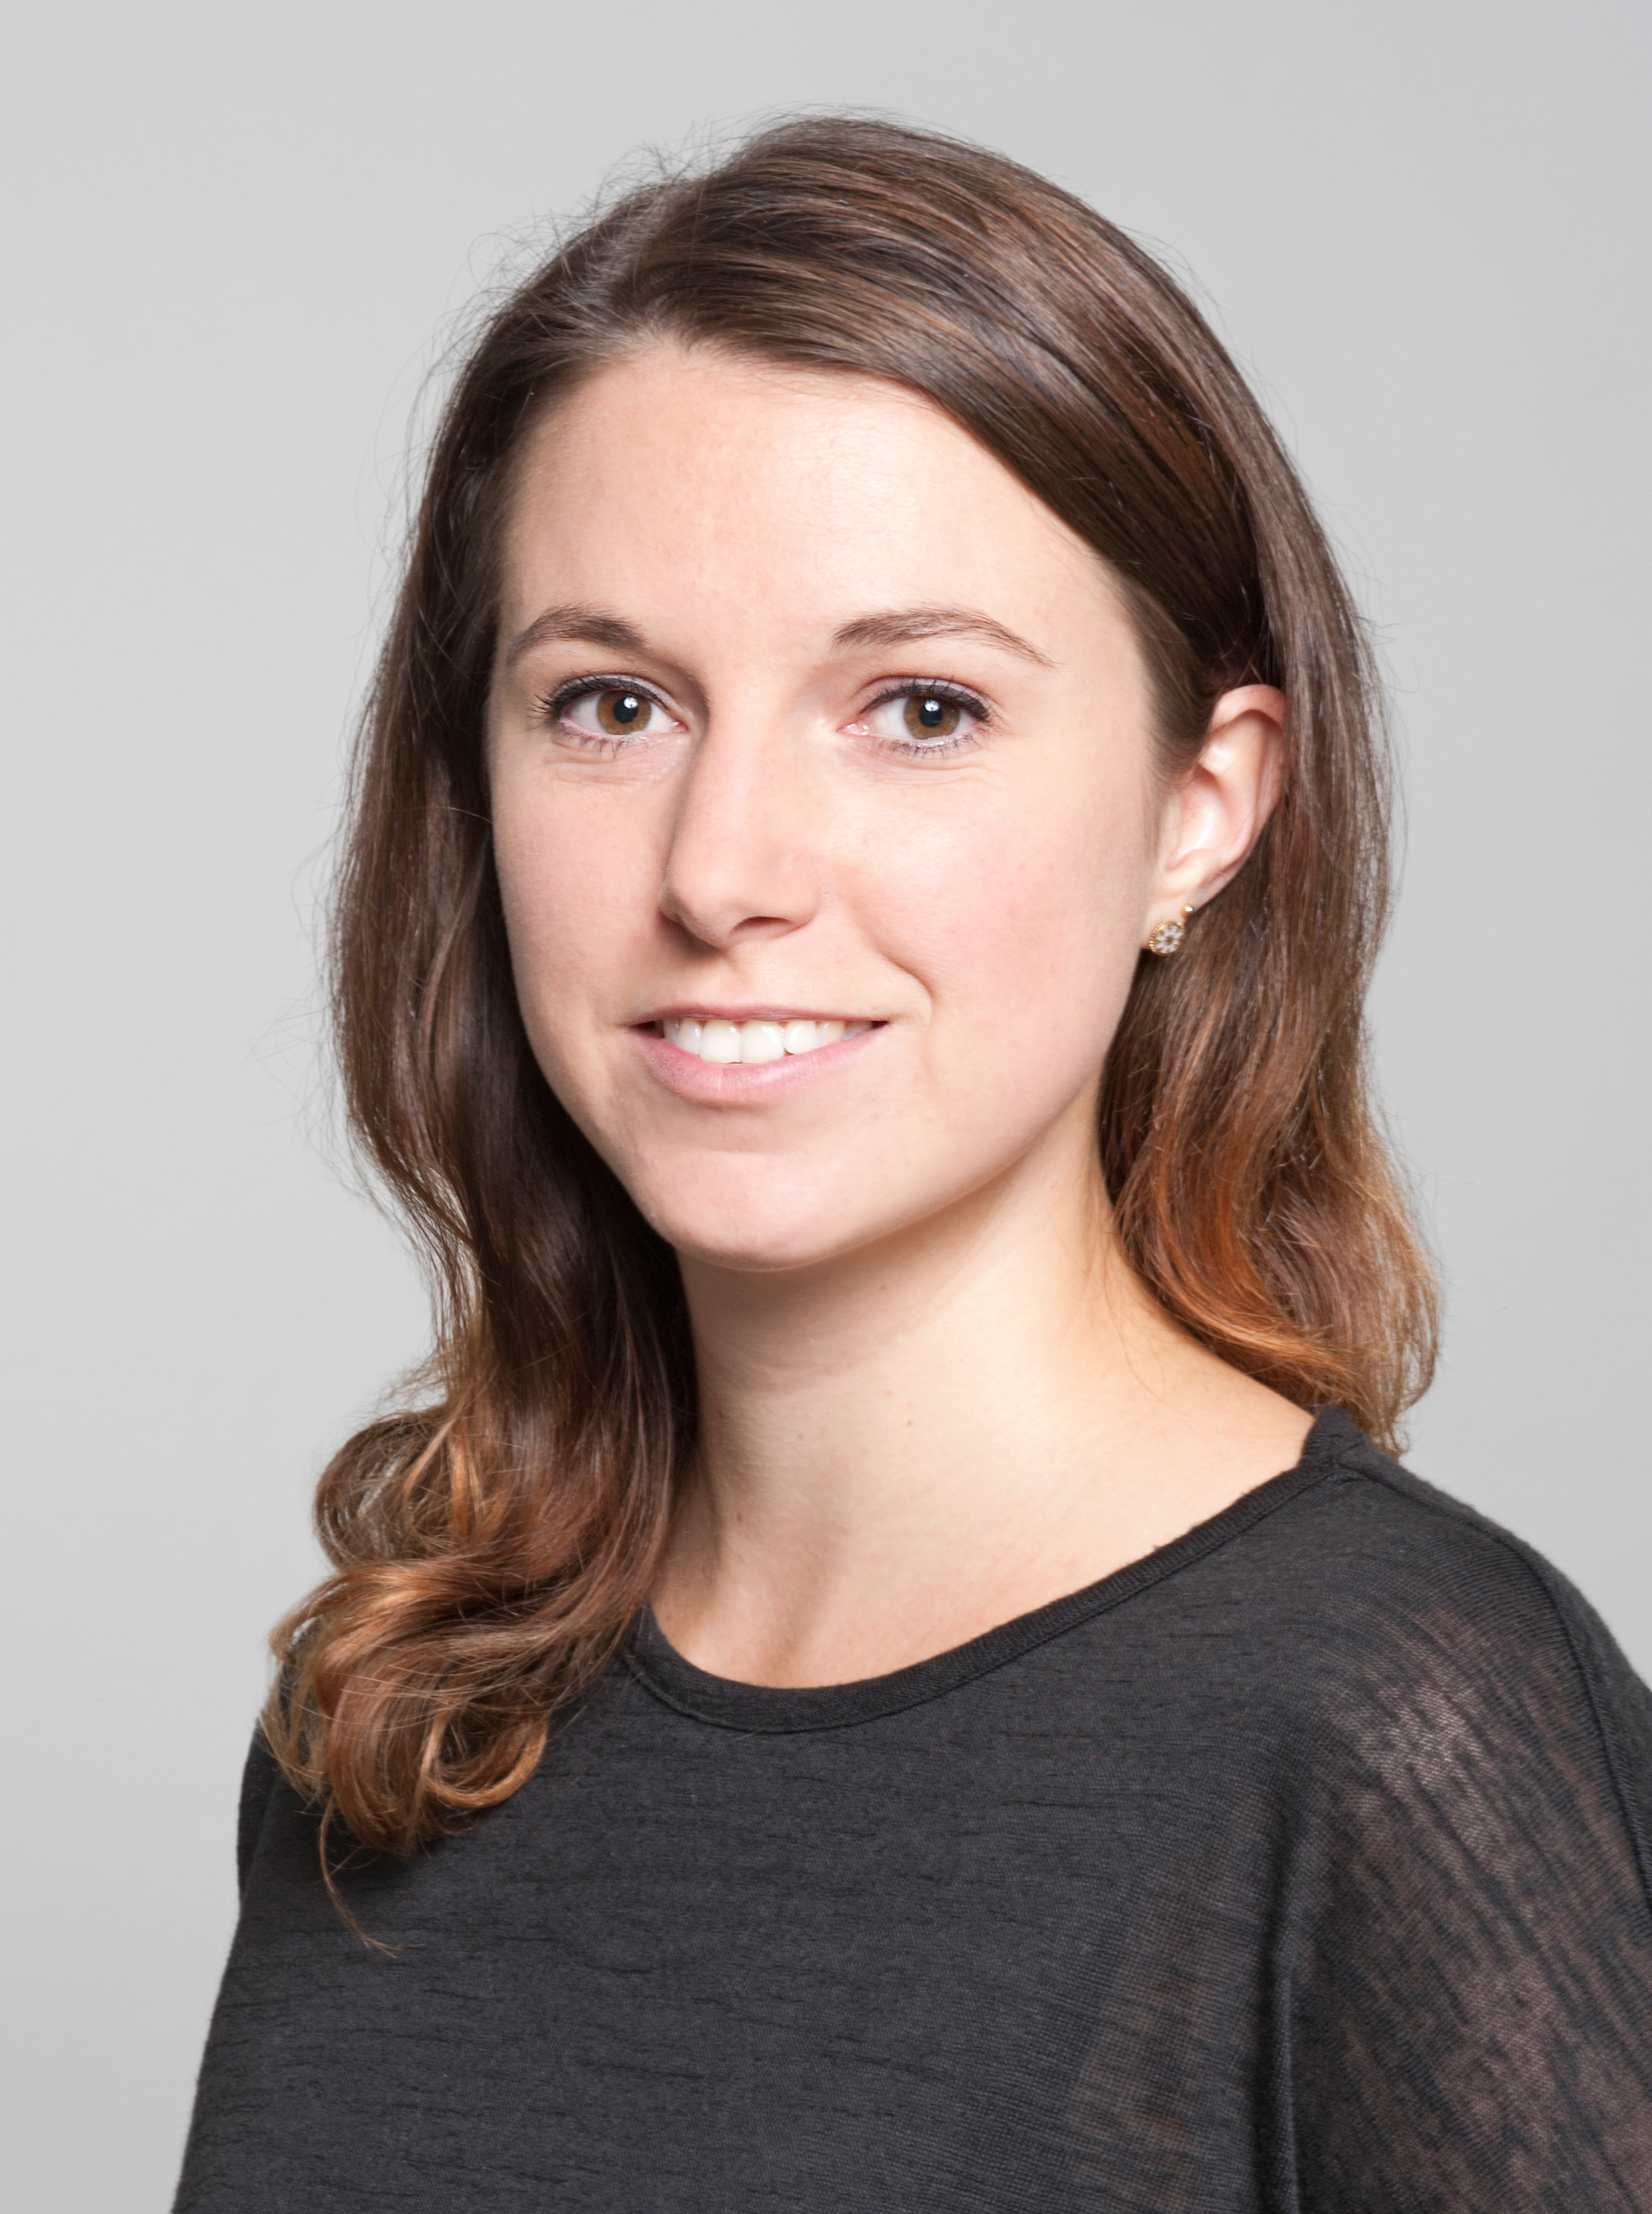 Dr. des. Hannah Mönninghoff